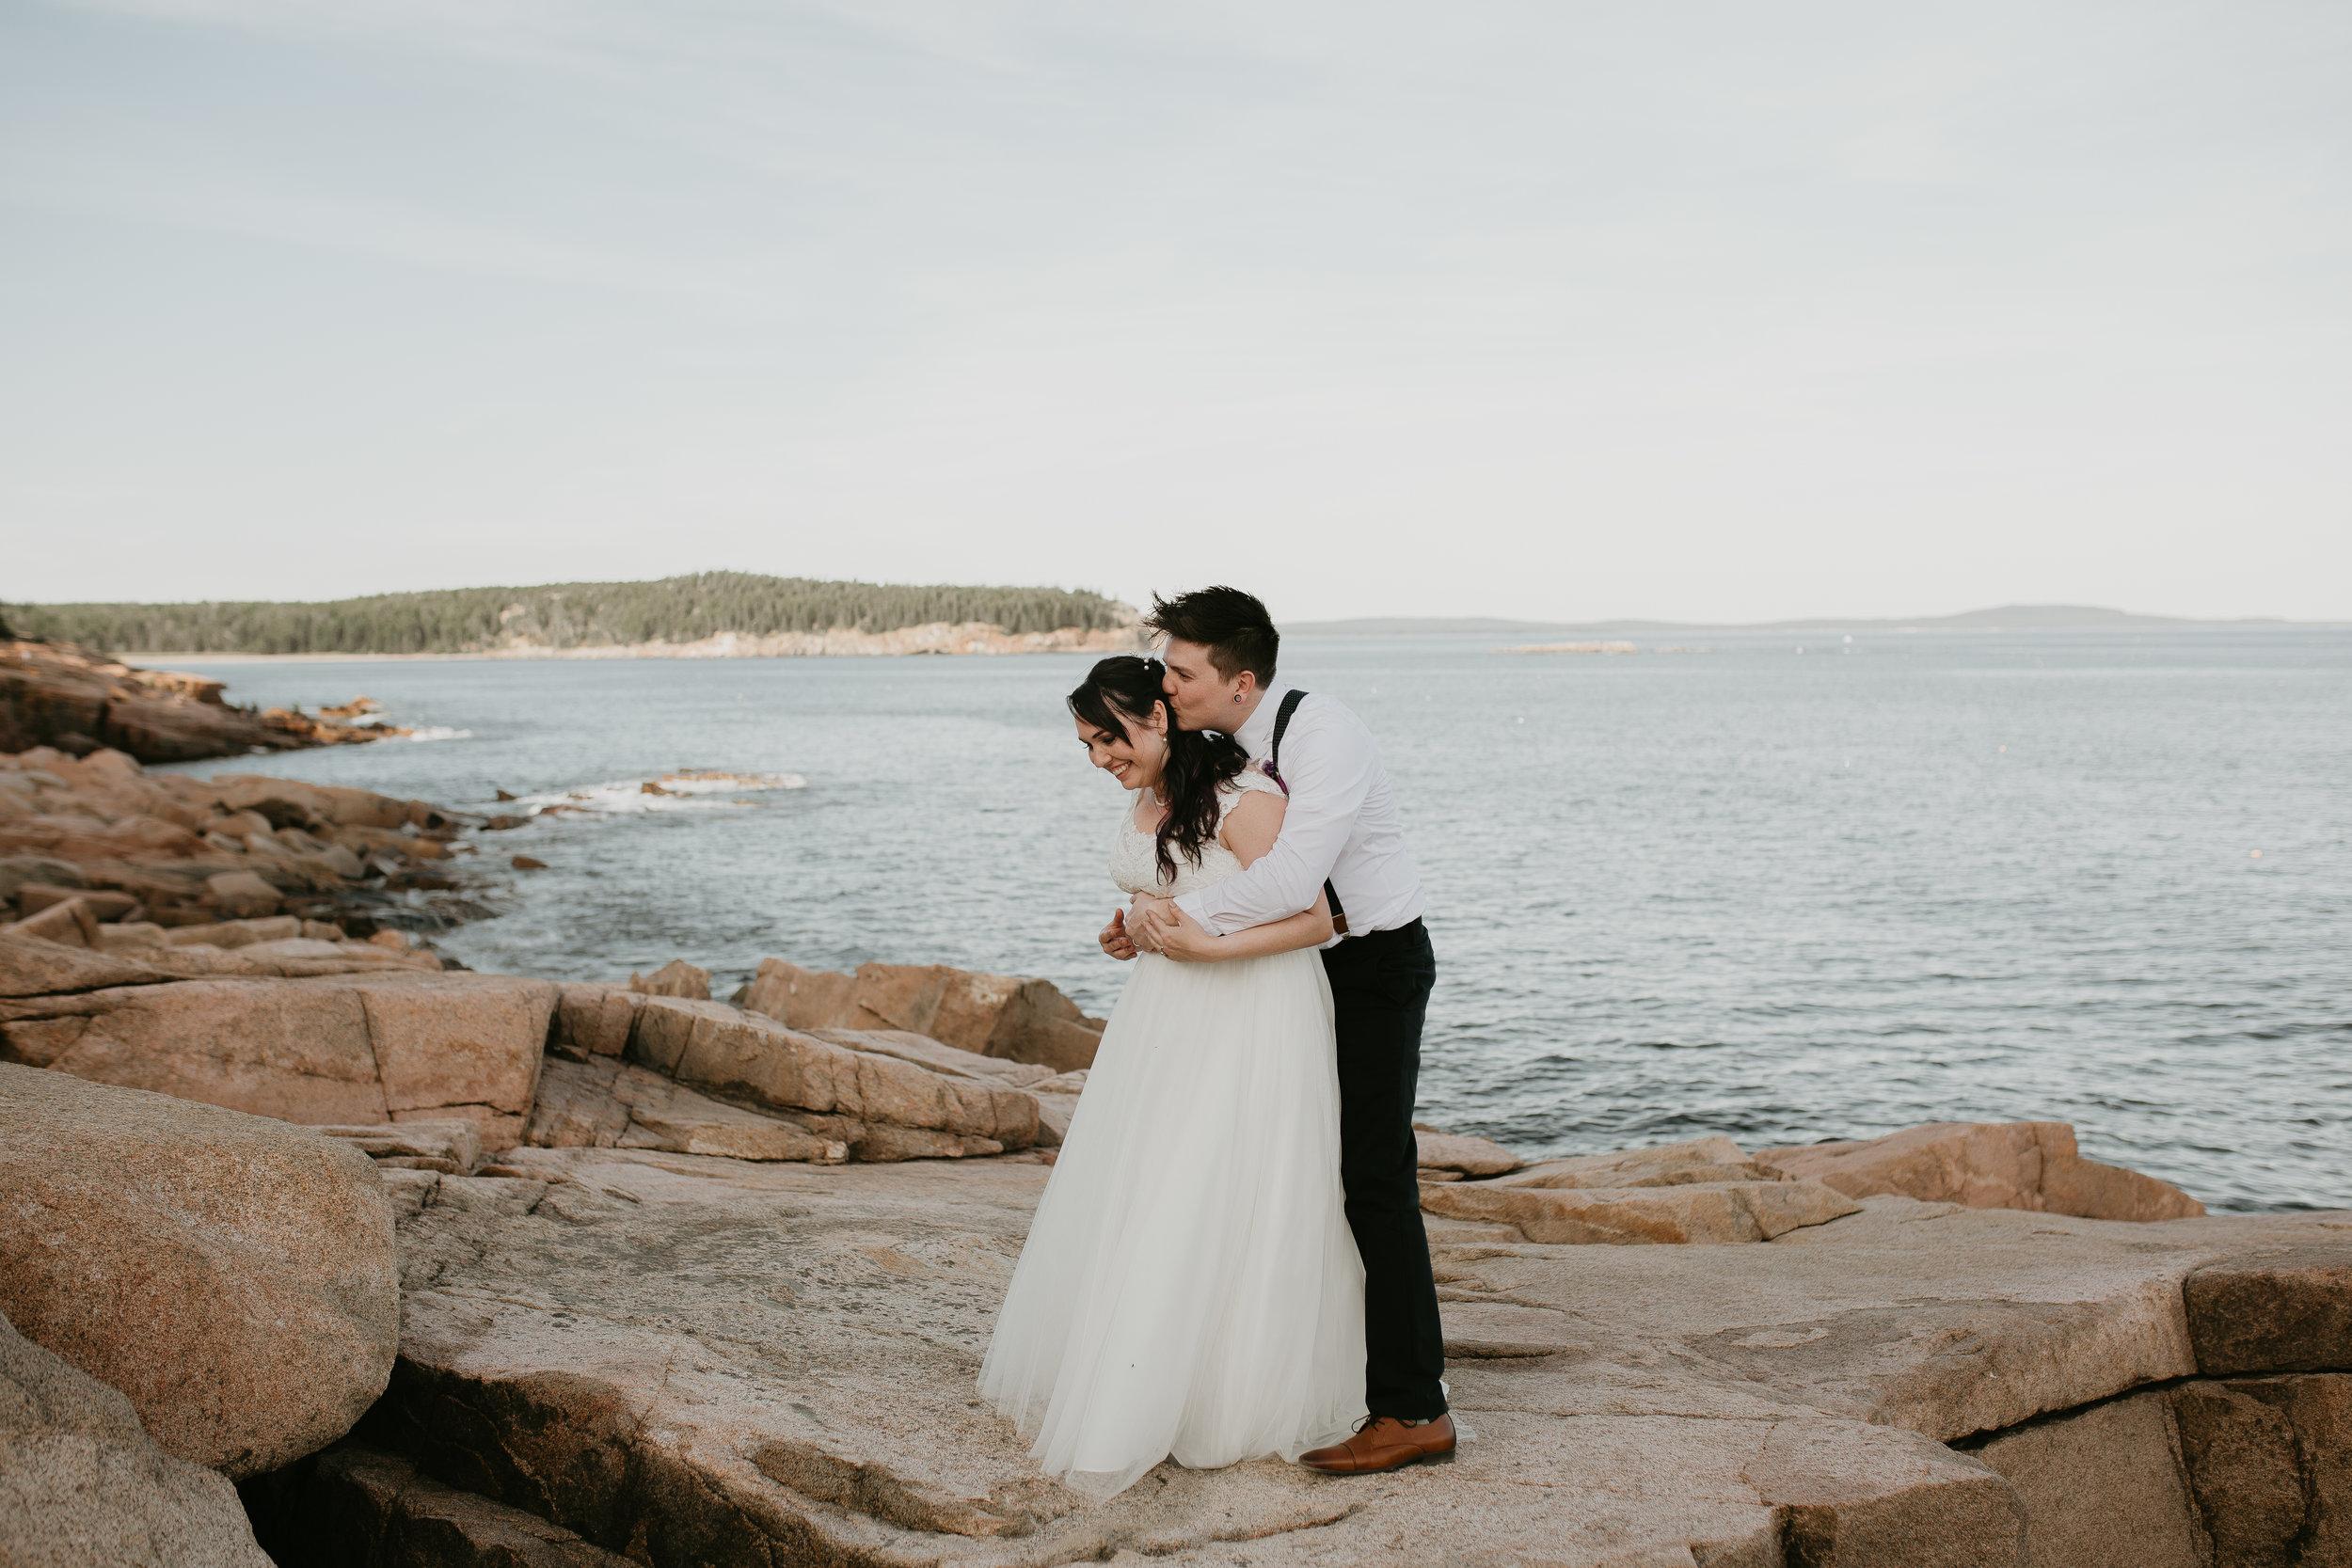 nicole-daacke-photography-Elopement-rocky-shoreline-coast-Acadia-National-Park-elopement-photographer-inspiration-maine-elopement-otter-cliffs-schoonic-head-point-45.jpg